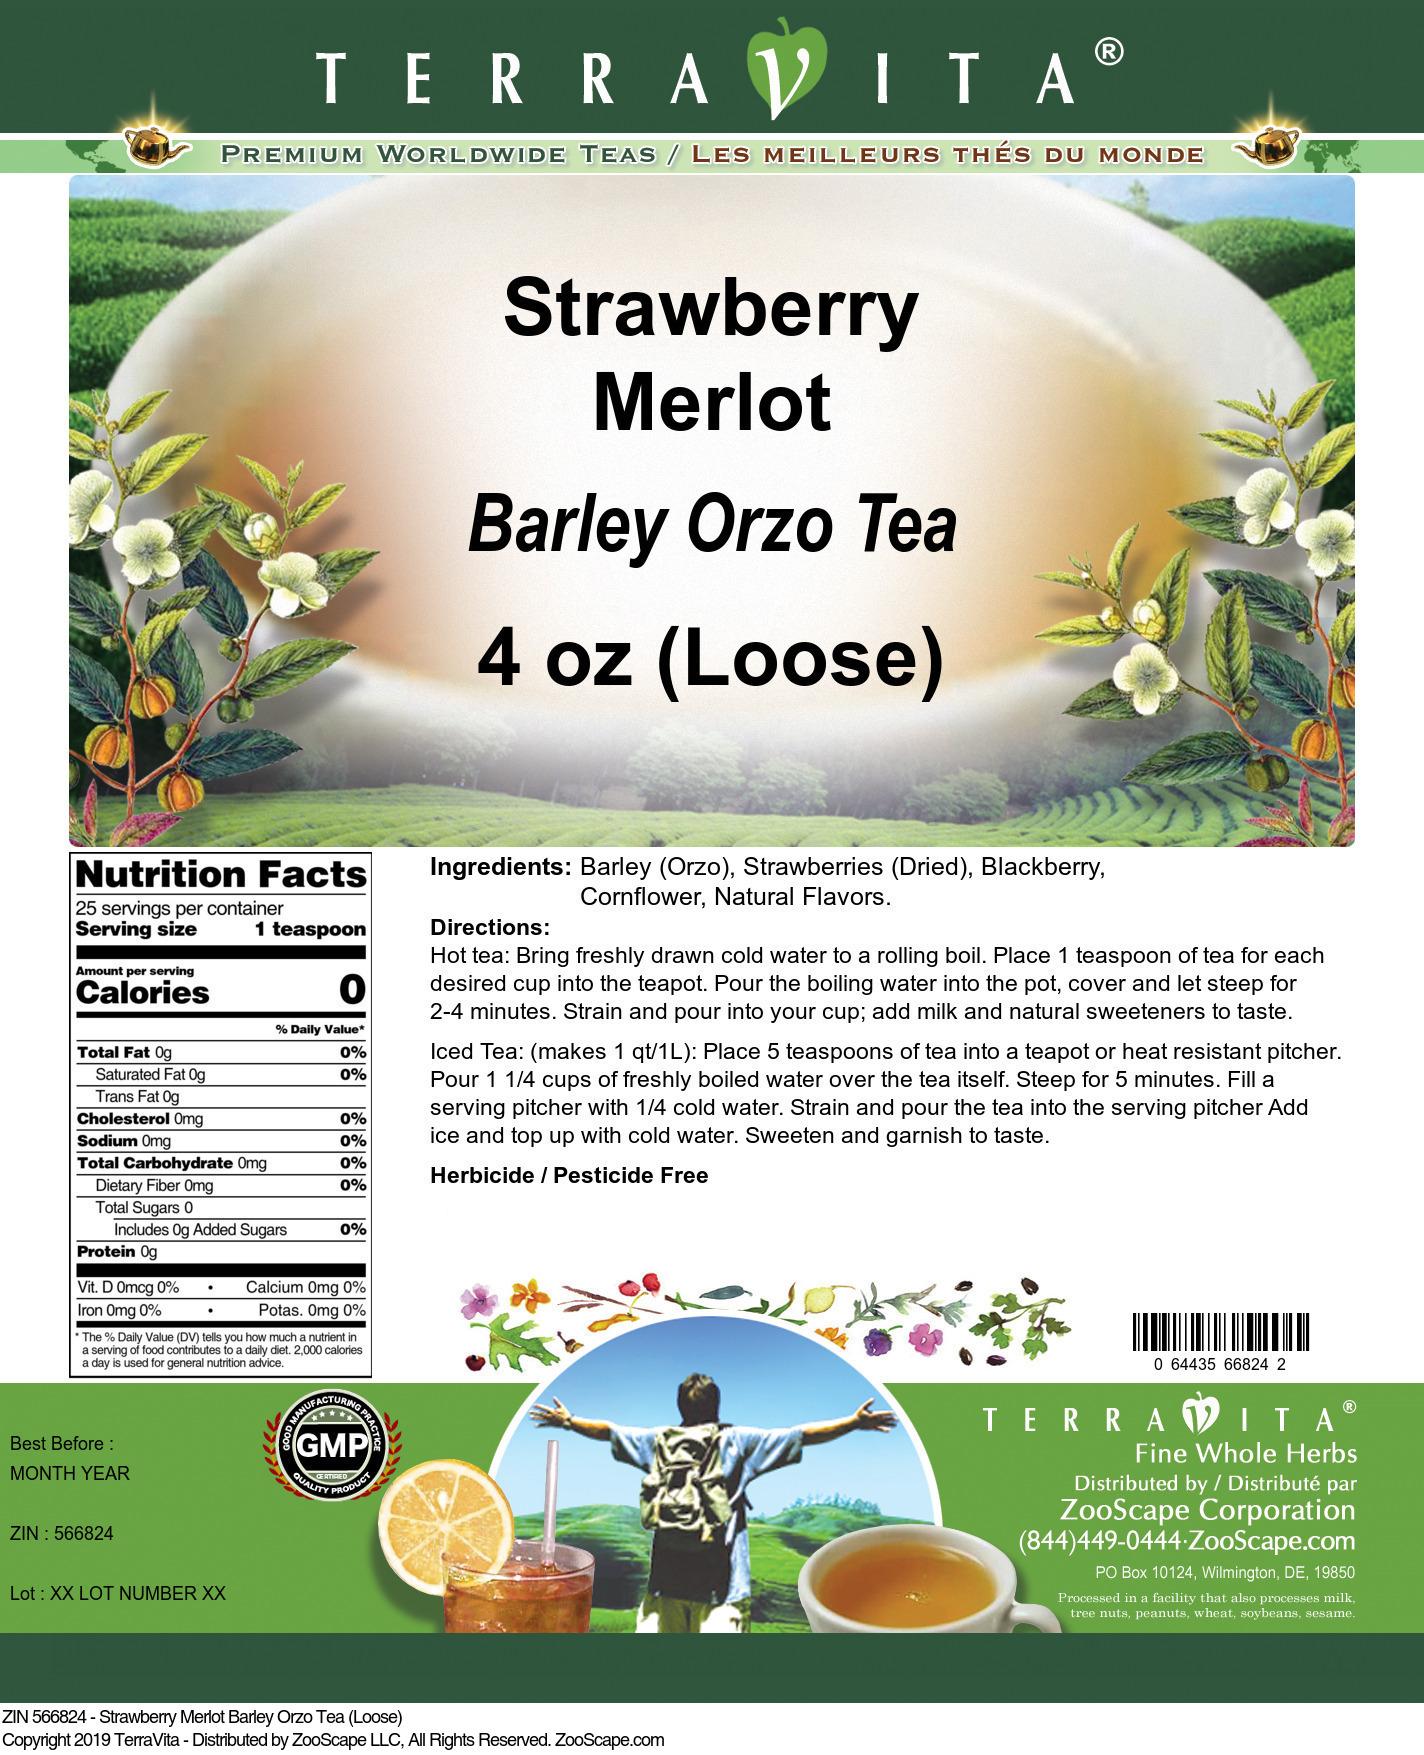 Strawberry Merlot Barley Orzo Tea (Loose)